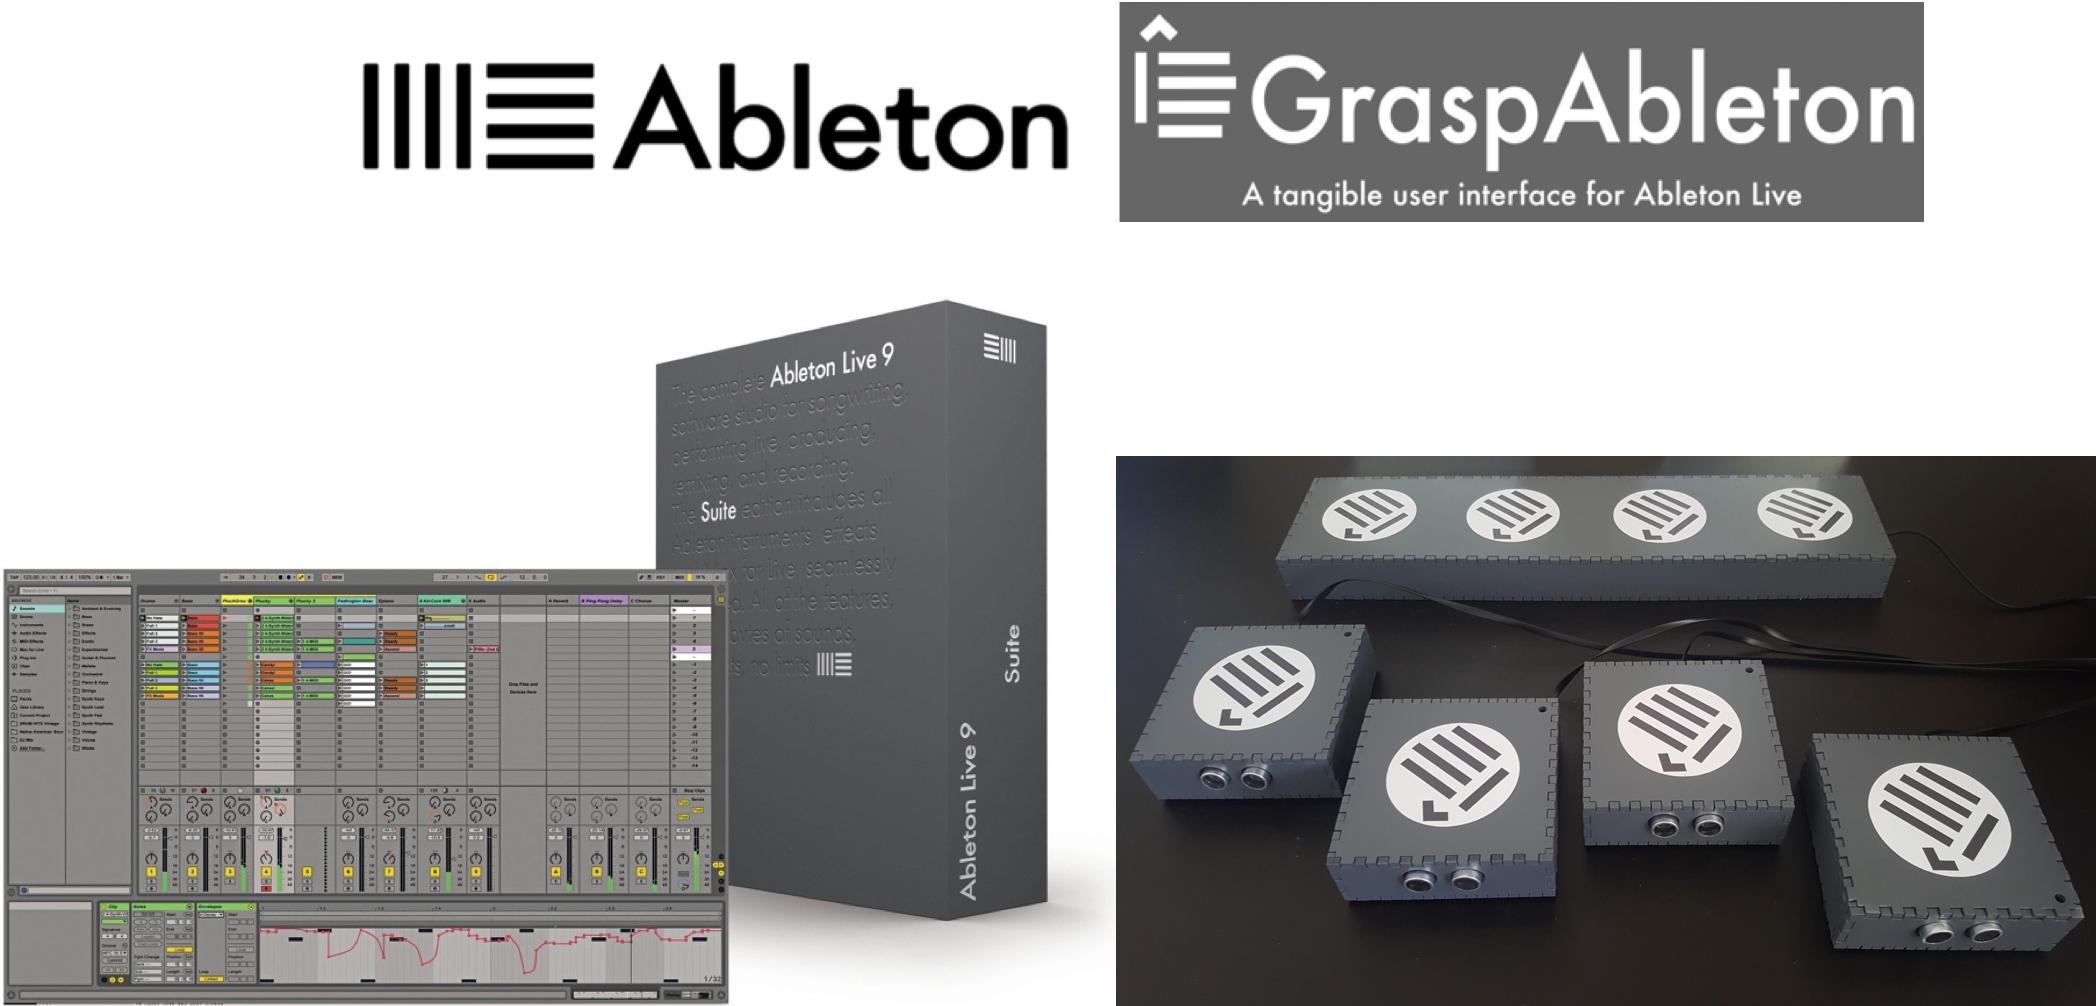 GraspAbleton's visual design matches that of Ableton